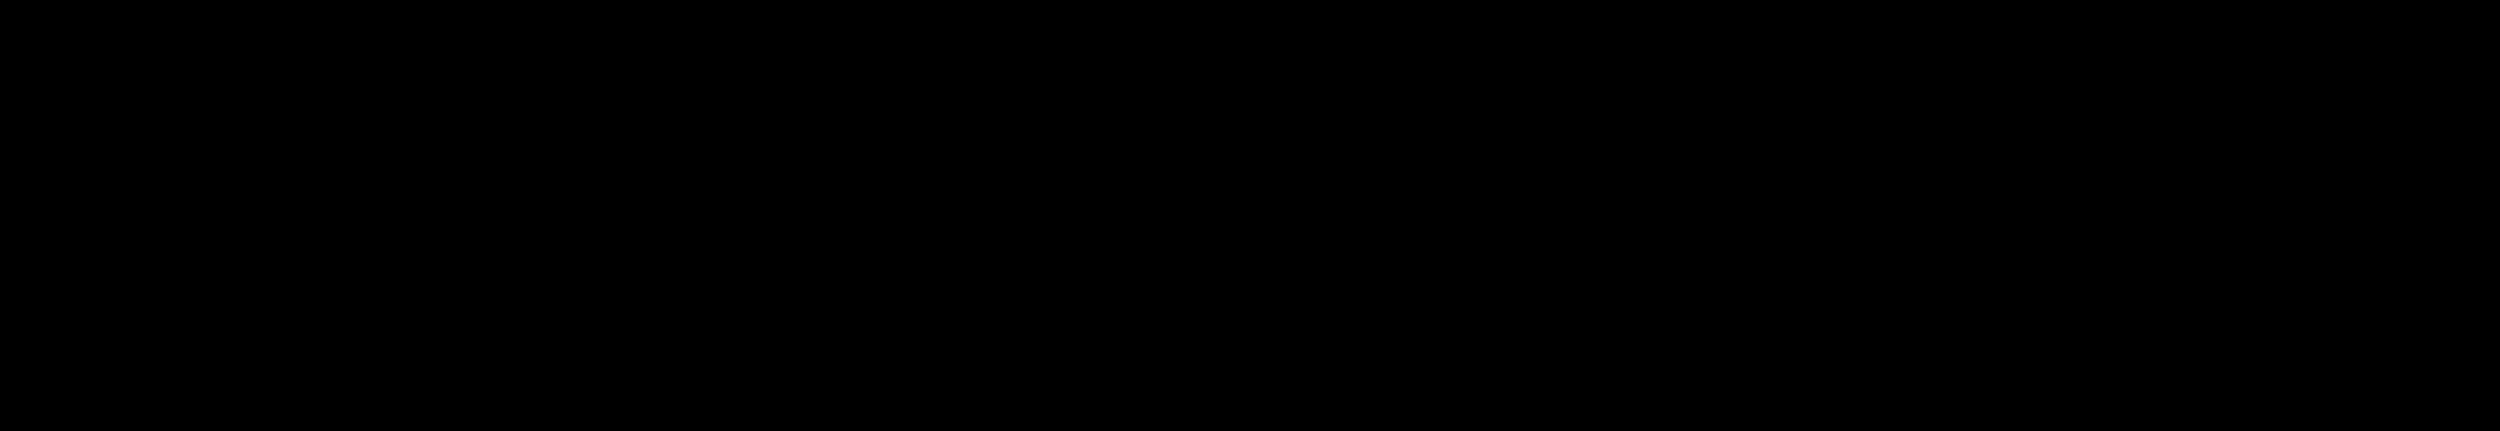 Music Vine Skinny Logo.png